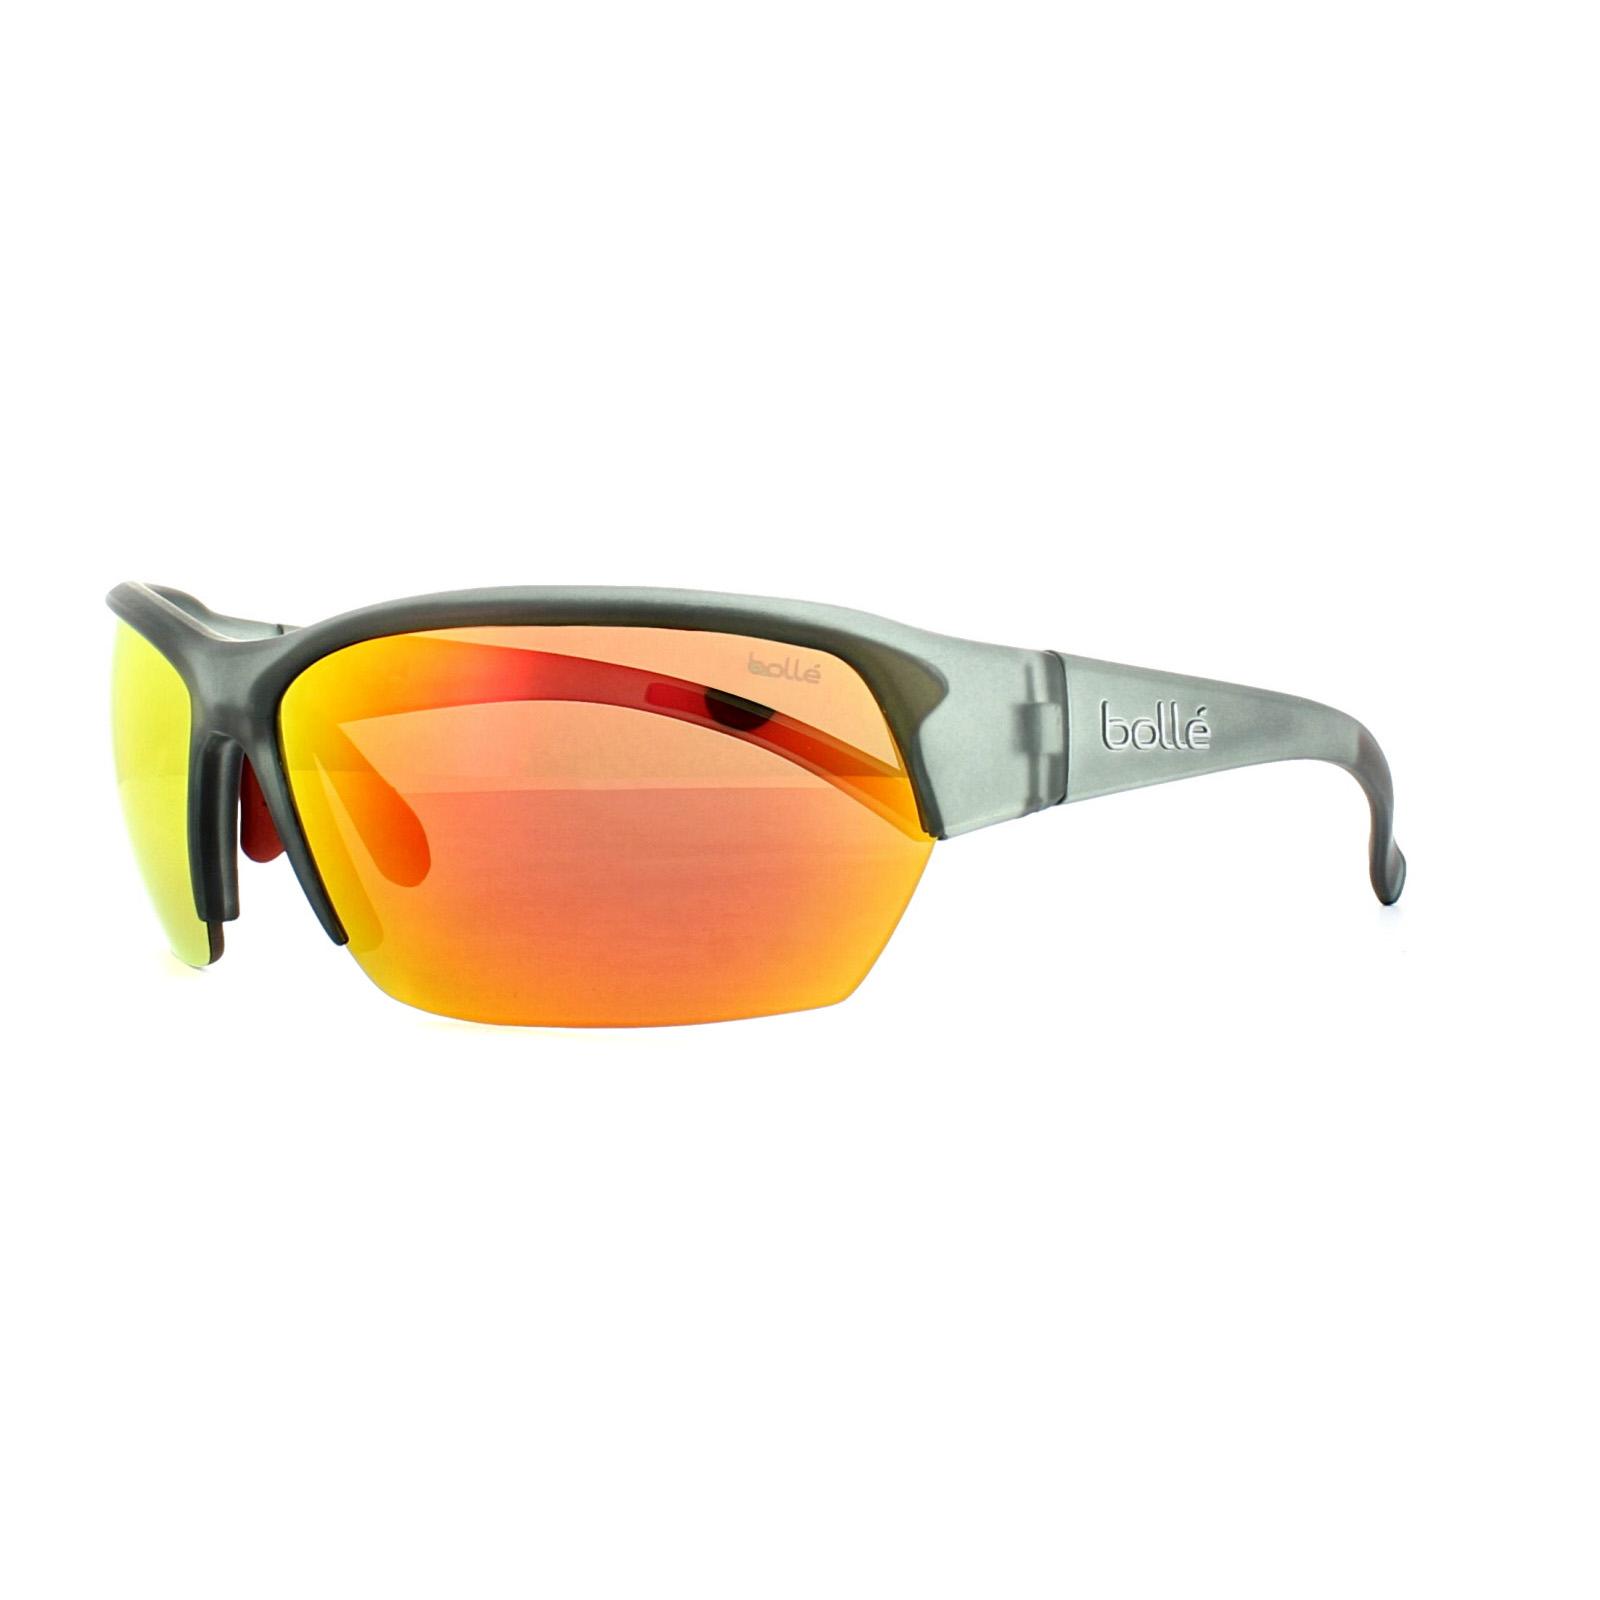 f456ca1dc6 Sentinel Bolle Sunglasses Ransom 11696 Satin Crystal Grey TNS Fire Red  Mirror Polarized